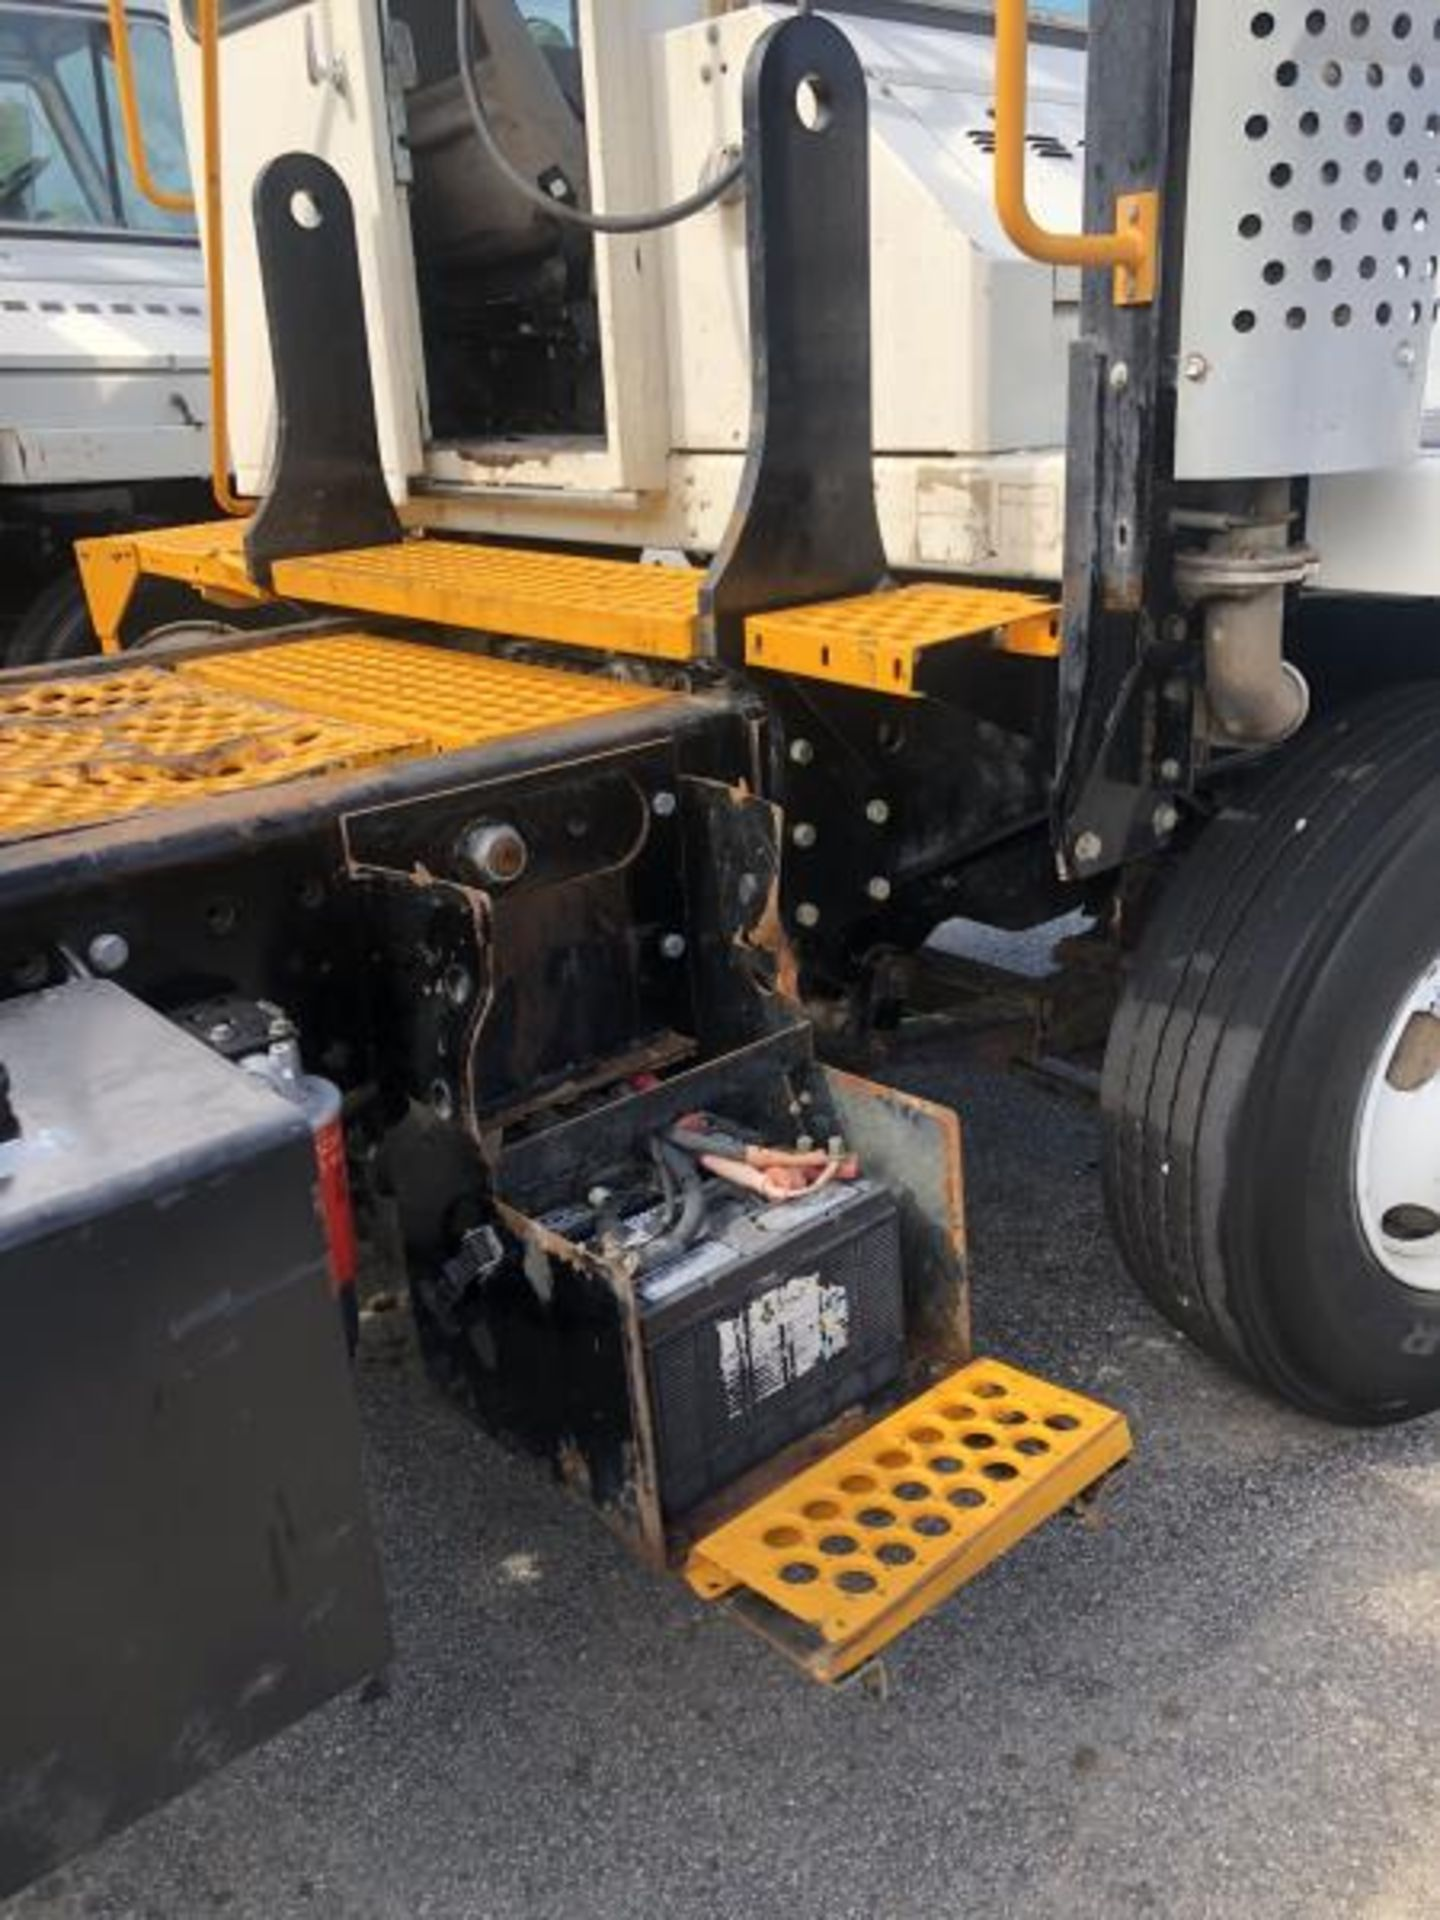 2015 Kalmar Ottawa 4x2 Yard Truck , SN: 338837 3,239.3 Hours, 3,125 Miles - Image 14 of 32